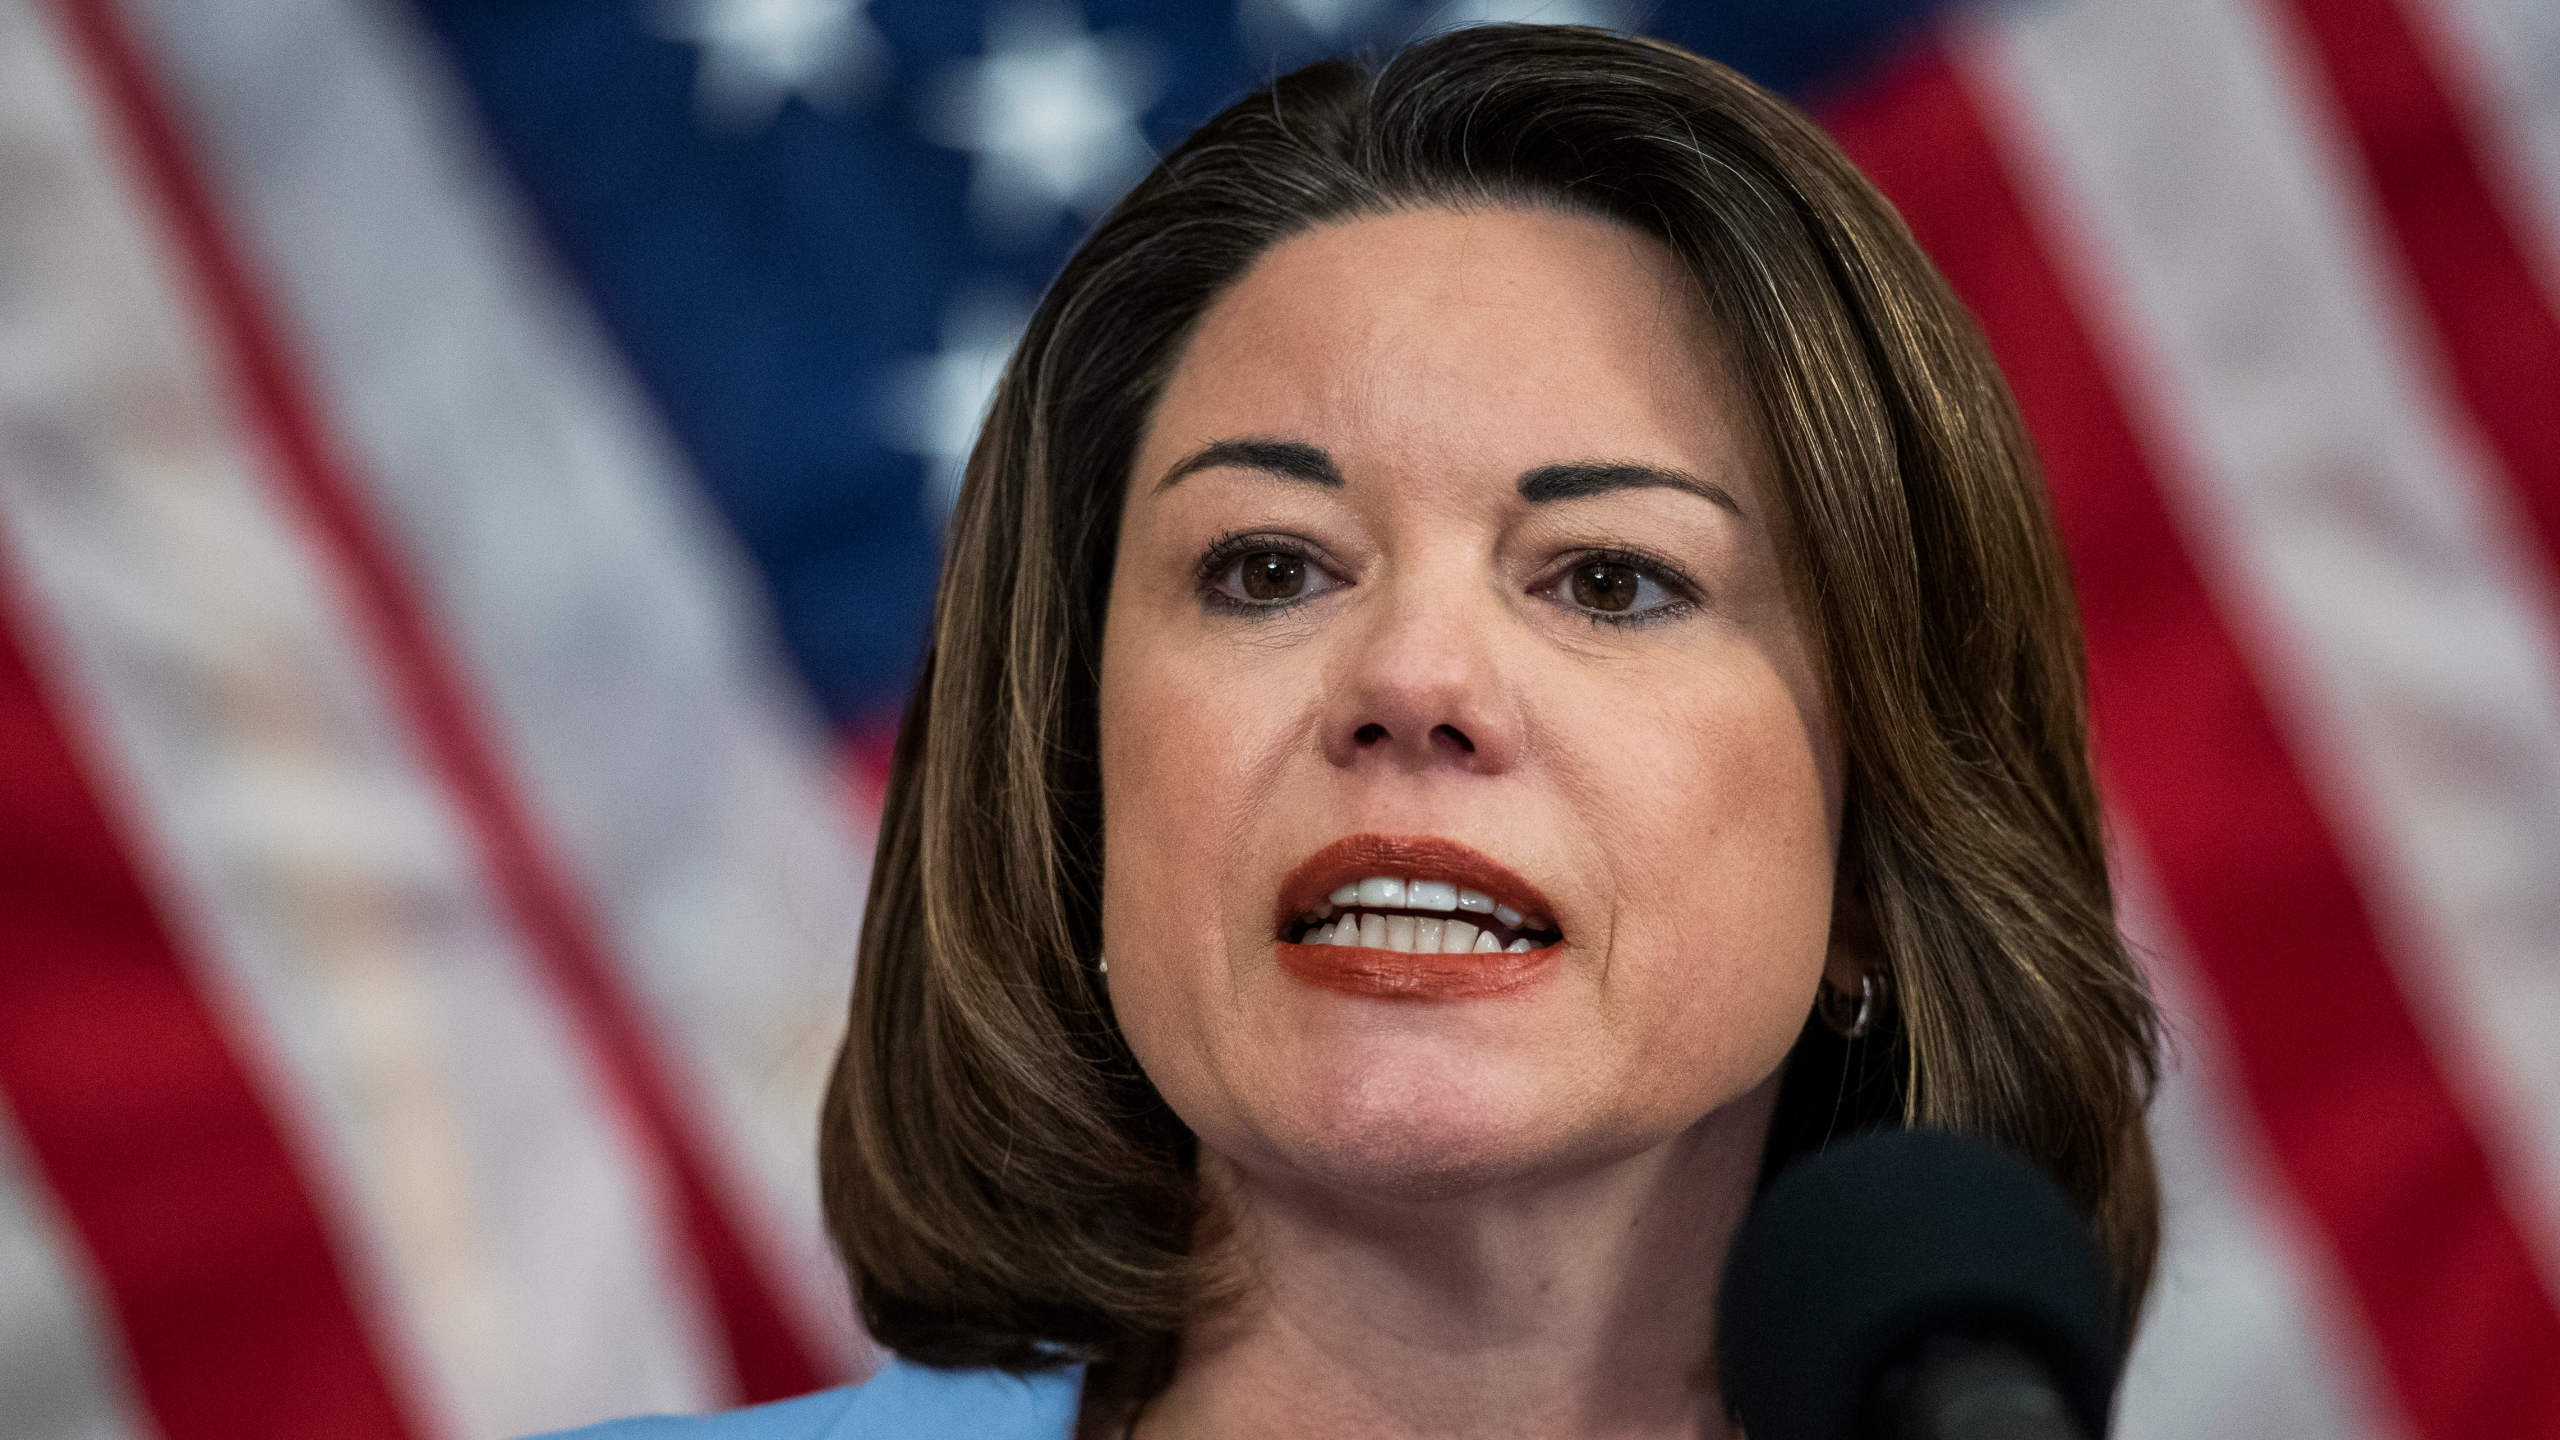 Angie Craig, Nancy Pelosi